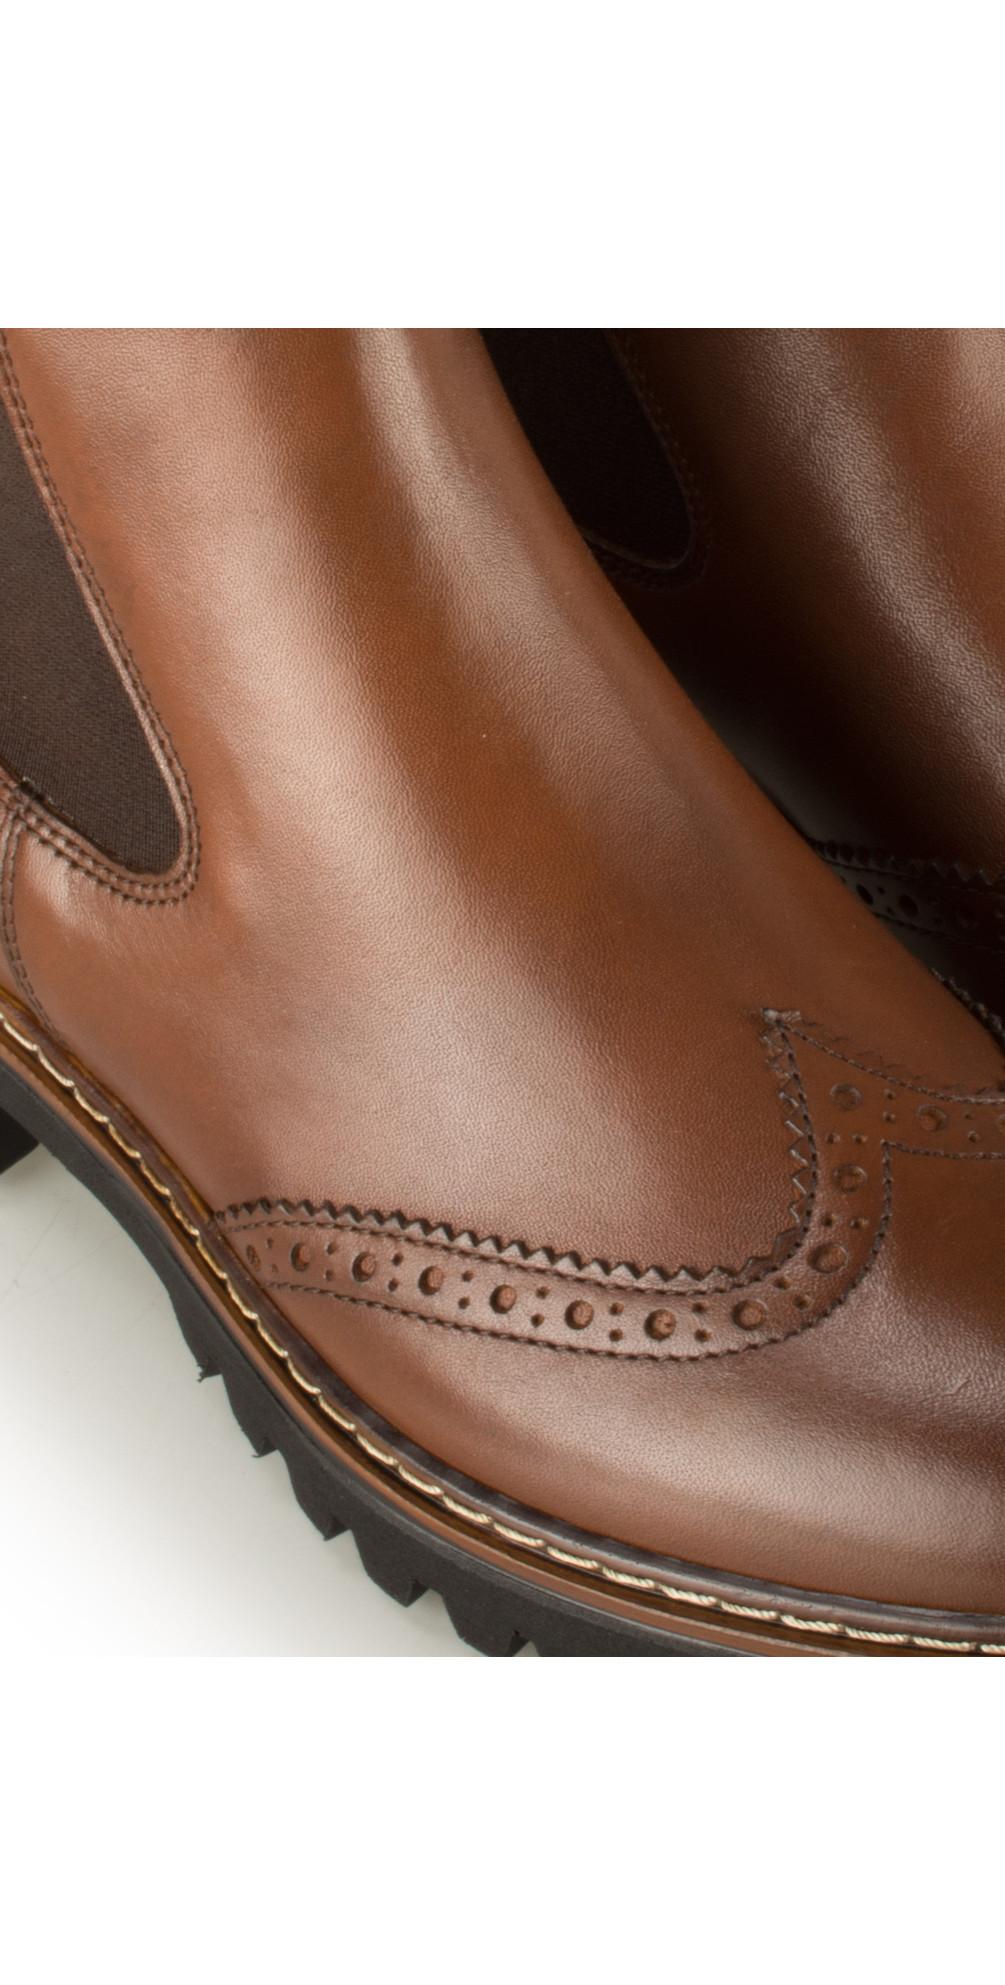 tamaris urban brogue chelsea boot in cognac. Black Bedroom Furniture Sets. Home Design Ideas